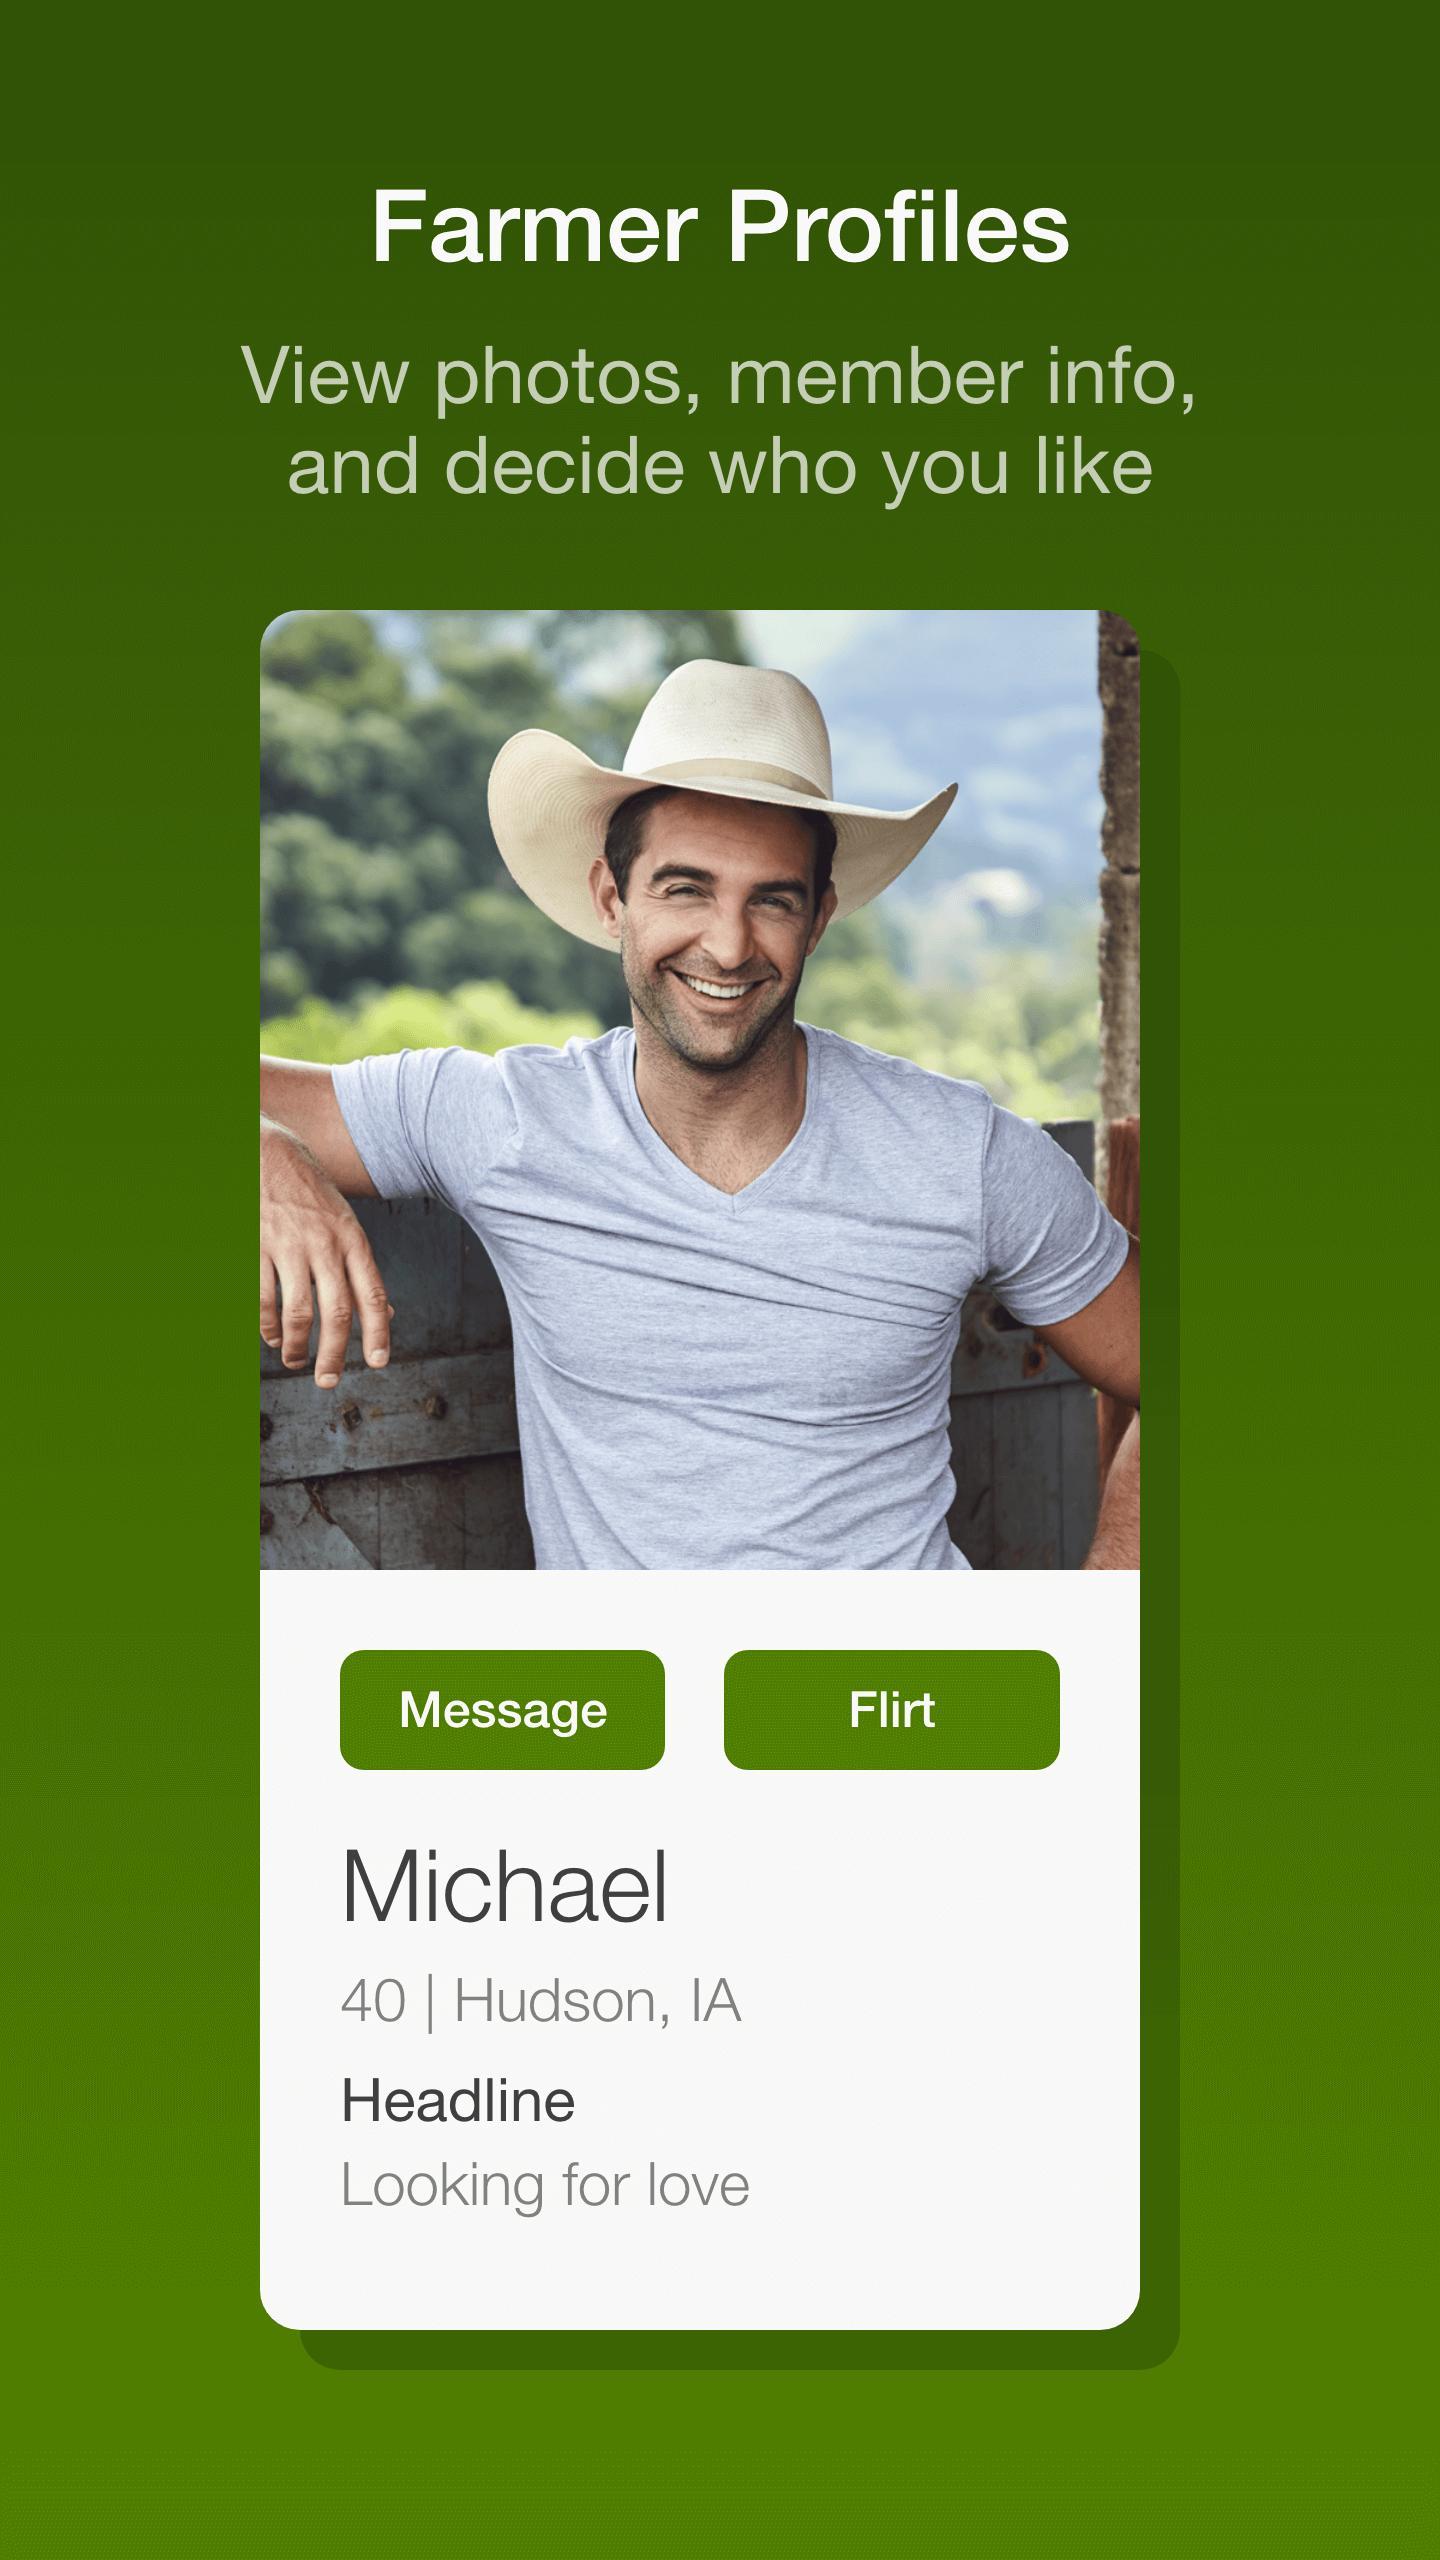 Online farmers dating filipinos dating